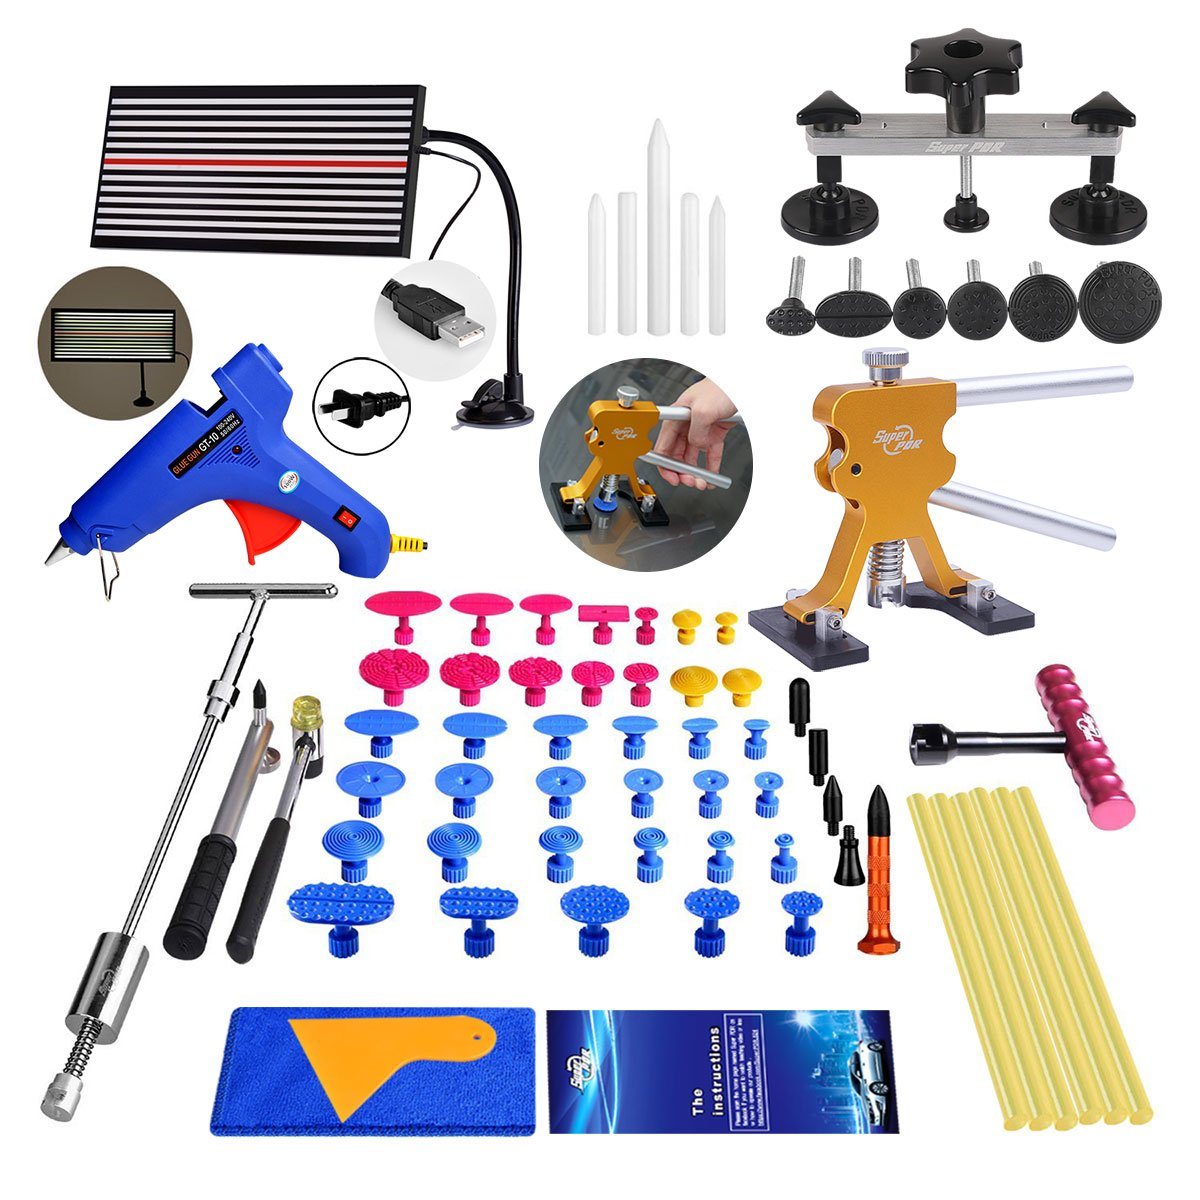 Super PDR 56Pcs Auto Car Paintless Dent Repair Tools kit - Dent Bridge Dent Puller Kit with Hot Melt Glue Gun Glue Sticks for Car Body Dent Repair by Super PDR (Image #1)